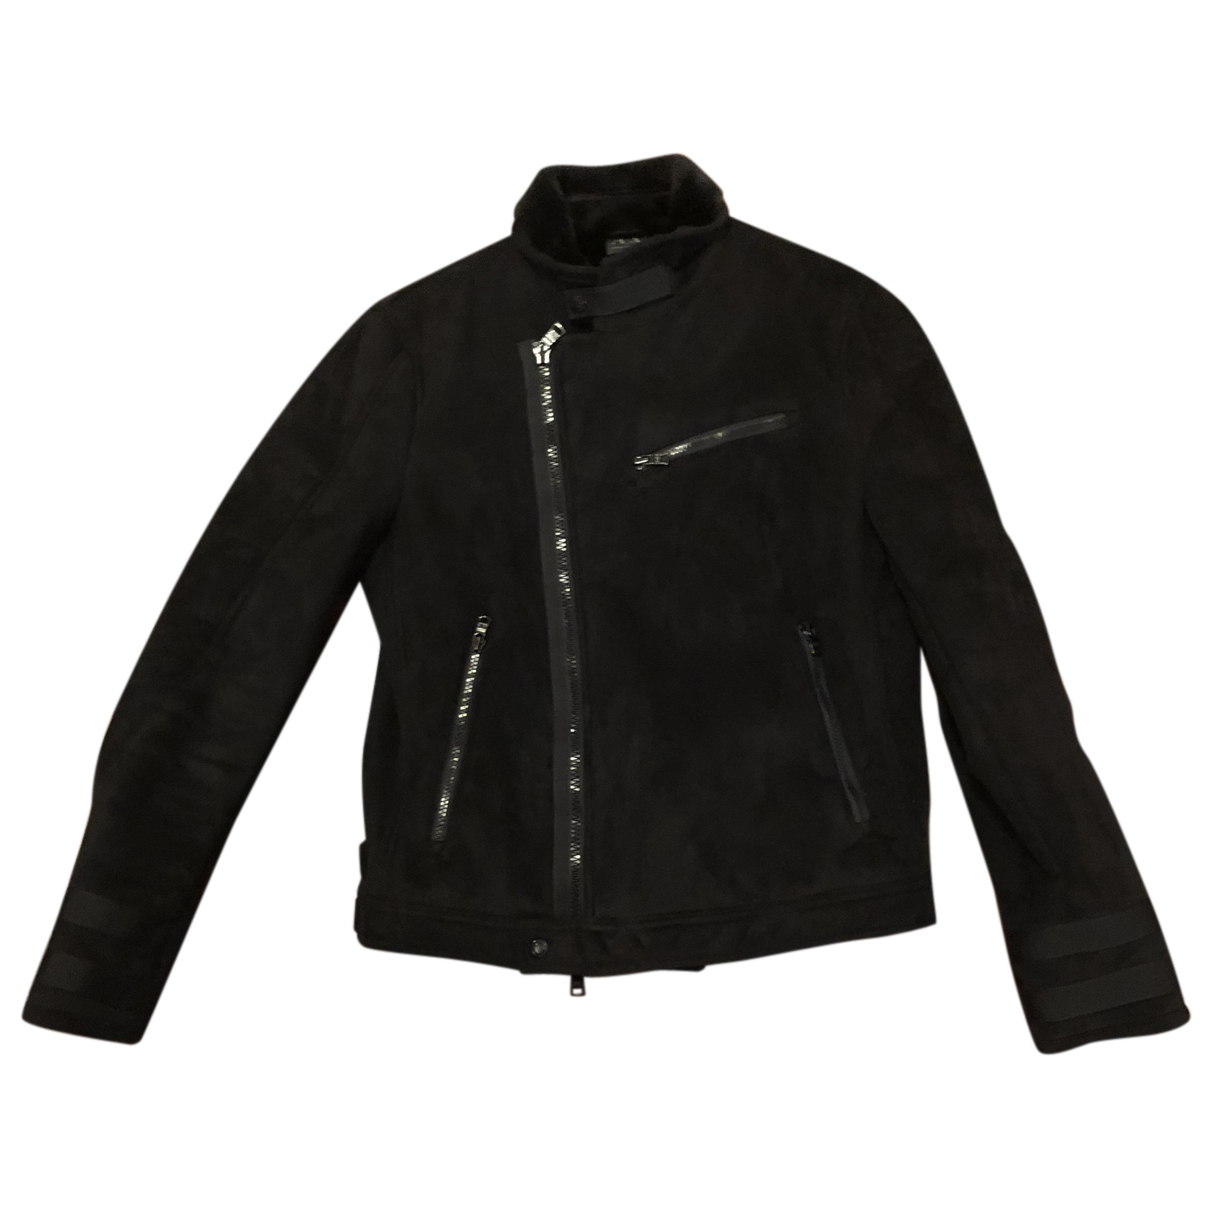 Emporio Armani N Black jacket  for Men M International